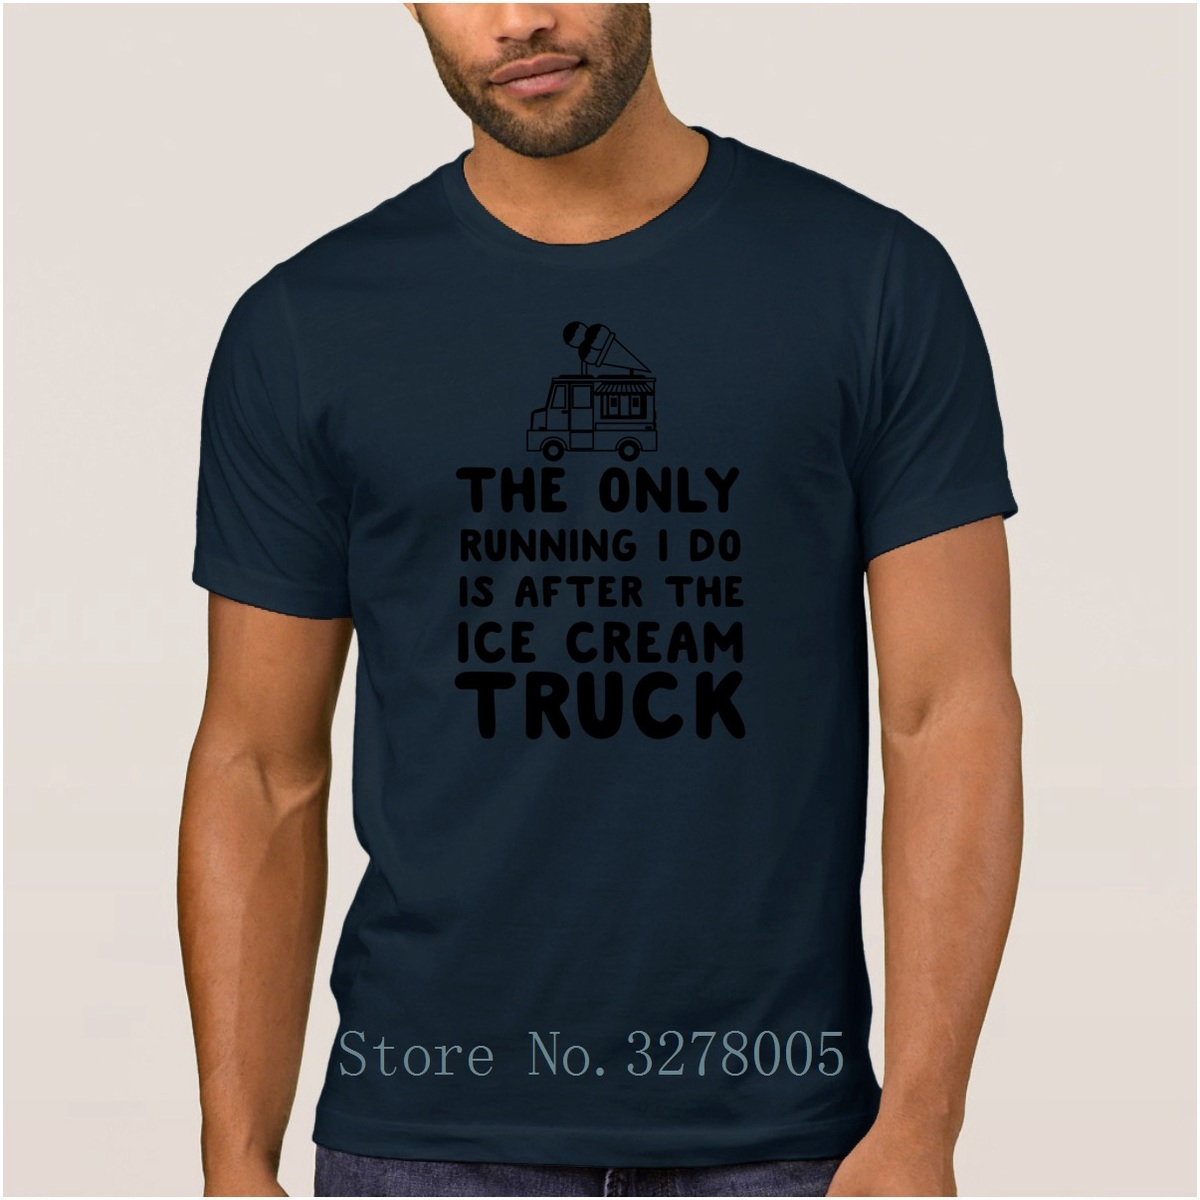 Letter The Only Runnings I Do Is After The Ice Cream Truck T Shirt Men Summer Men's T-Shirt Streetwear Cotton Tee Shirt Man